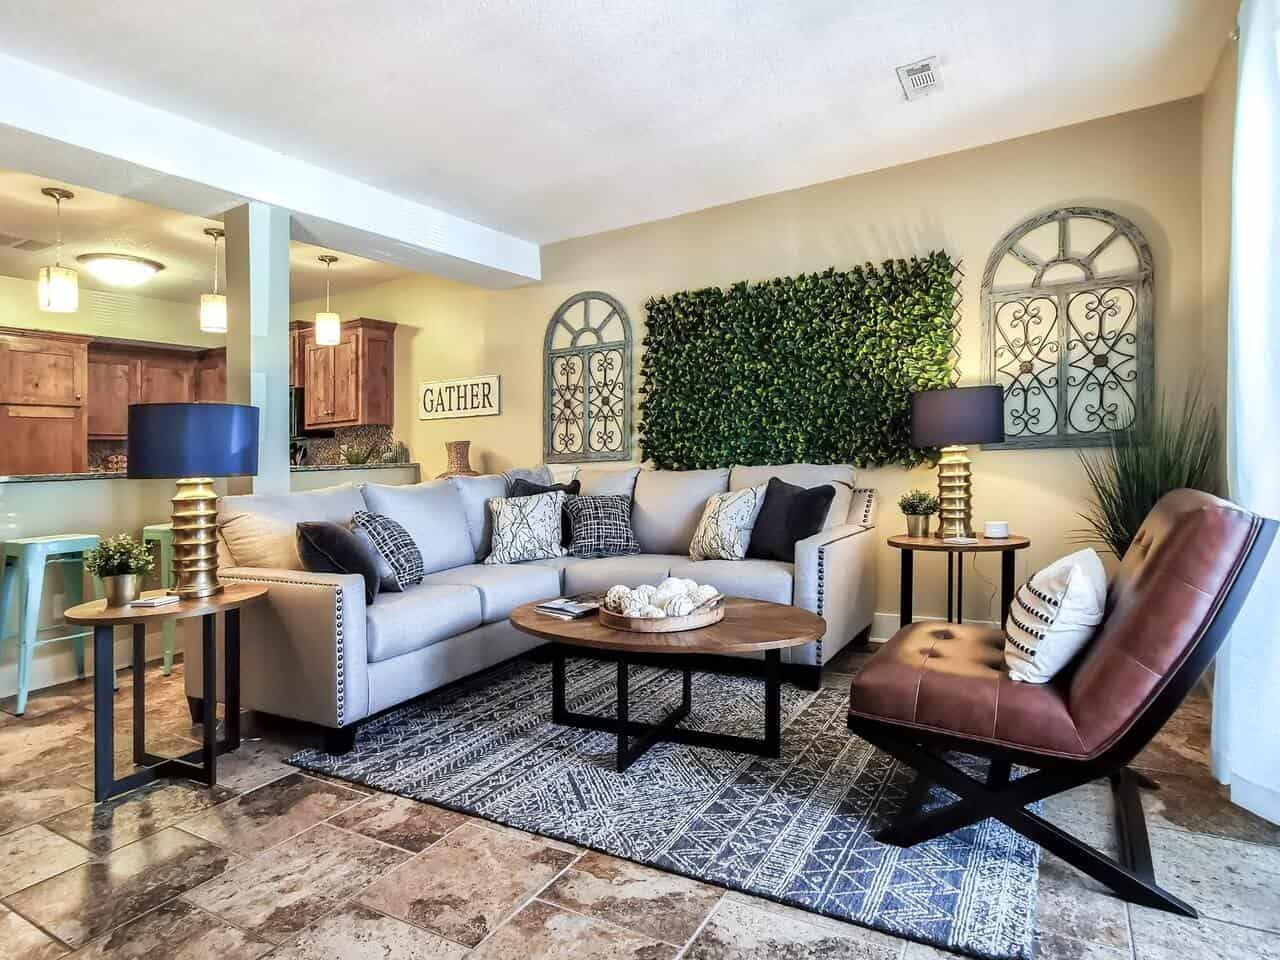 Image of Airbnb rental in Kansas City, Missouri